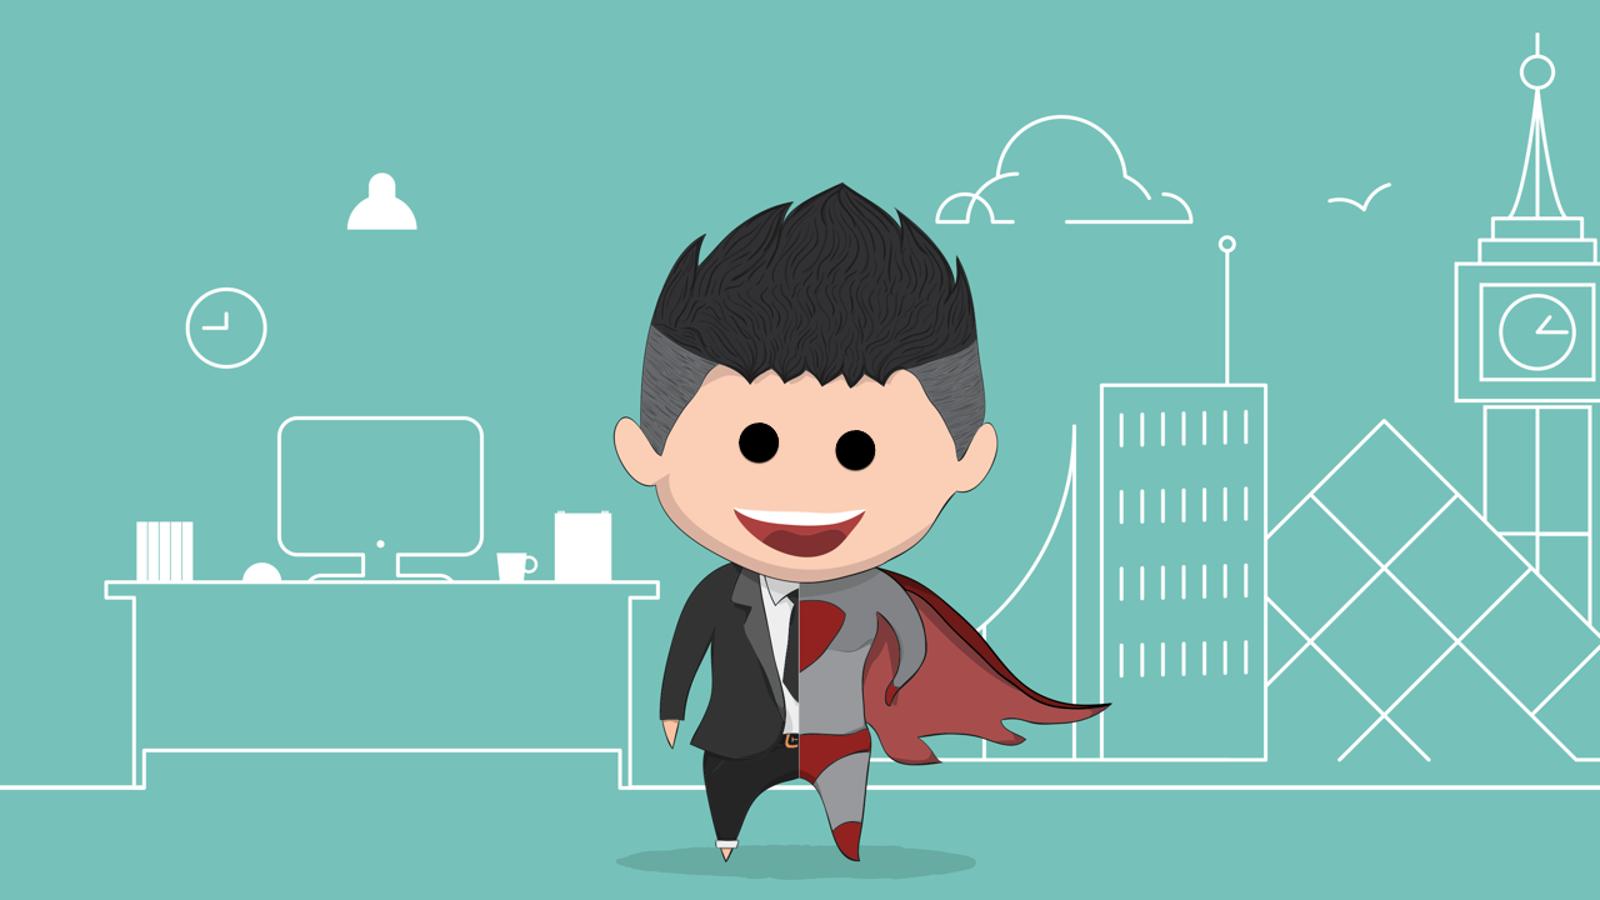 Instead of Work-Life Balance, Try Focusing on Boundaries